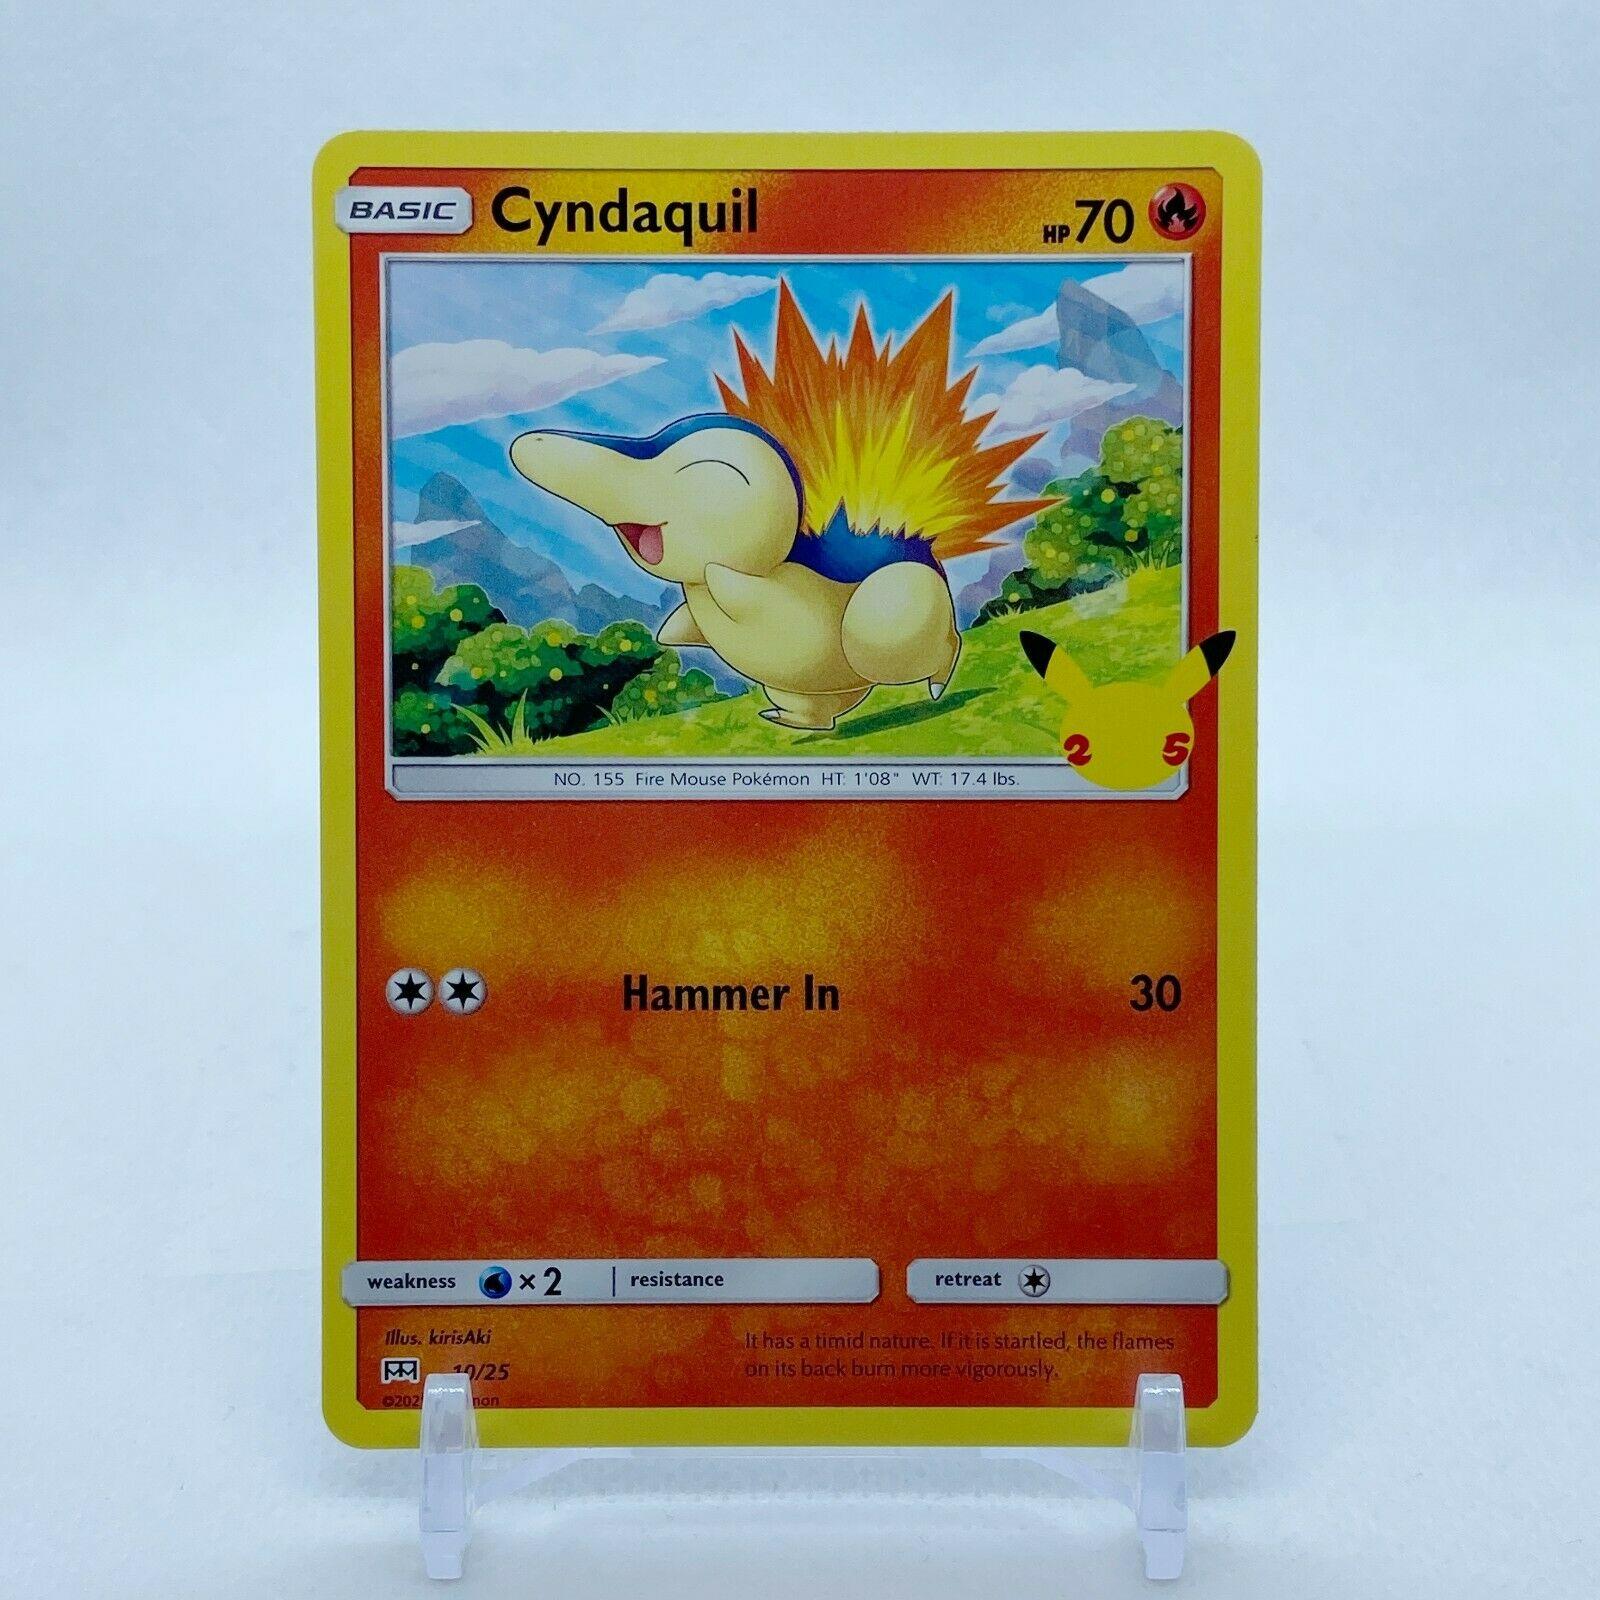 Cyndaquil - 10/25 Mcdonald's Promo 25th Anniversary  Starter Pokemon - NM/MINT